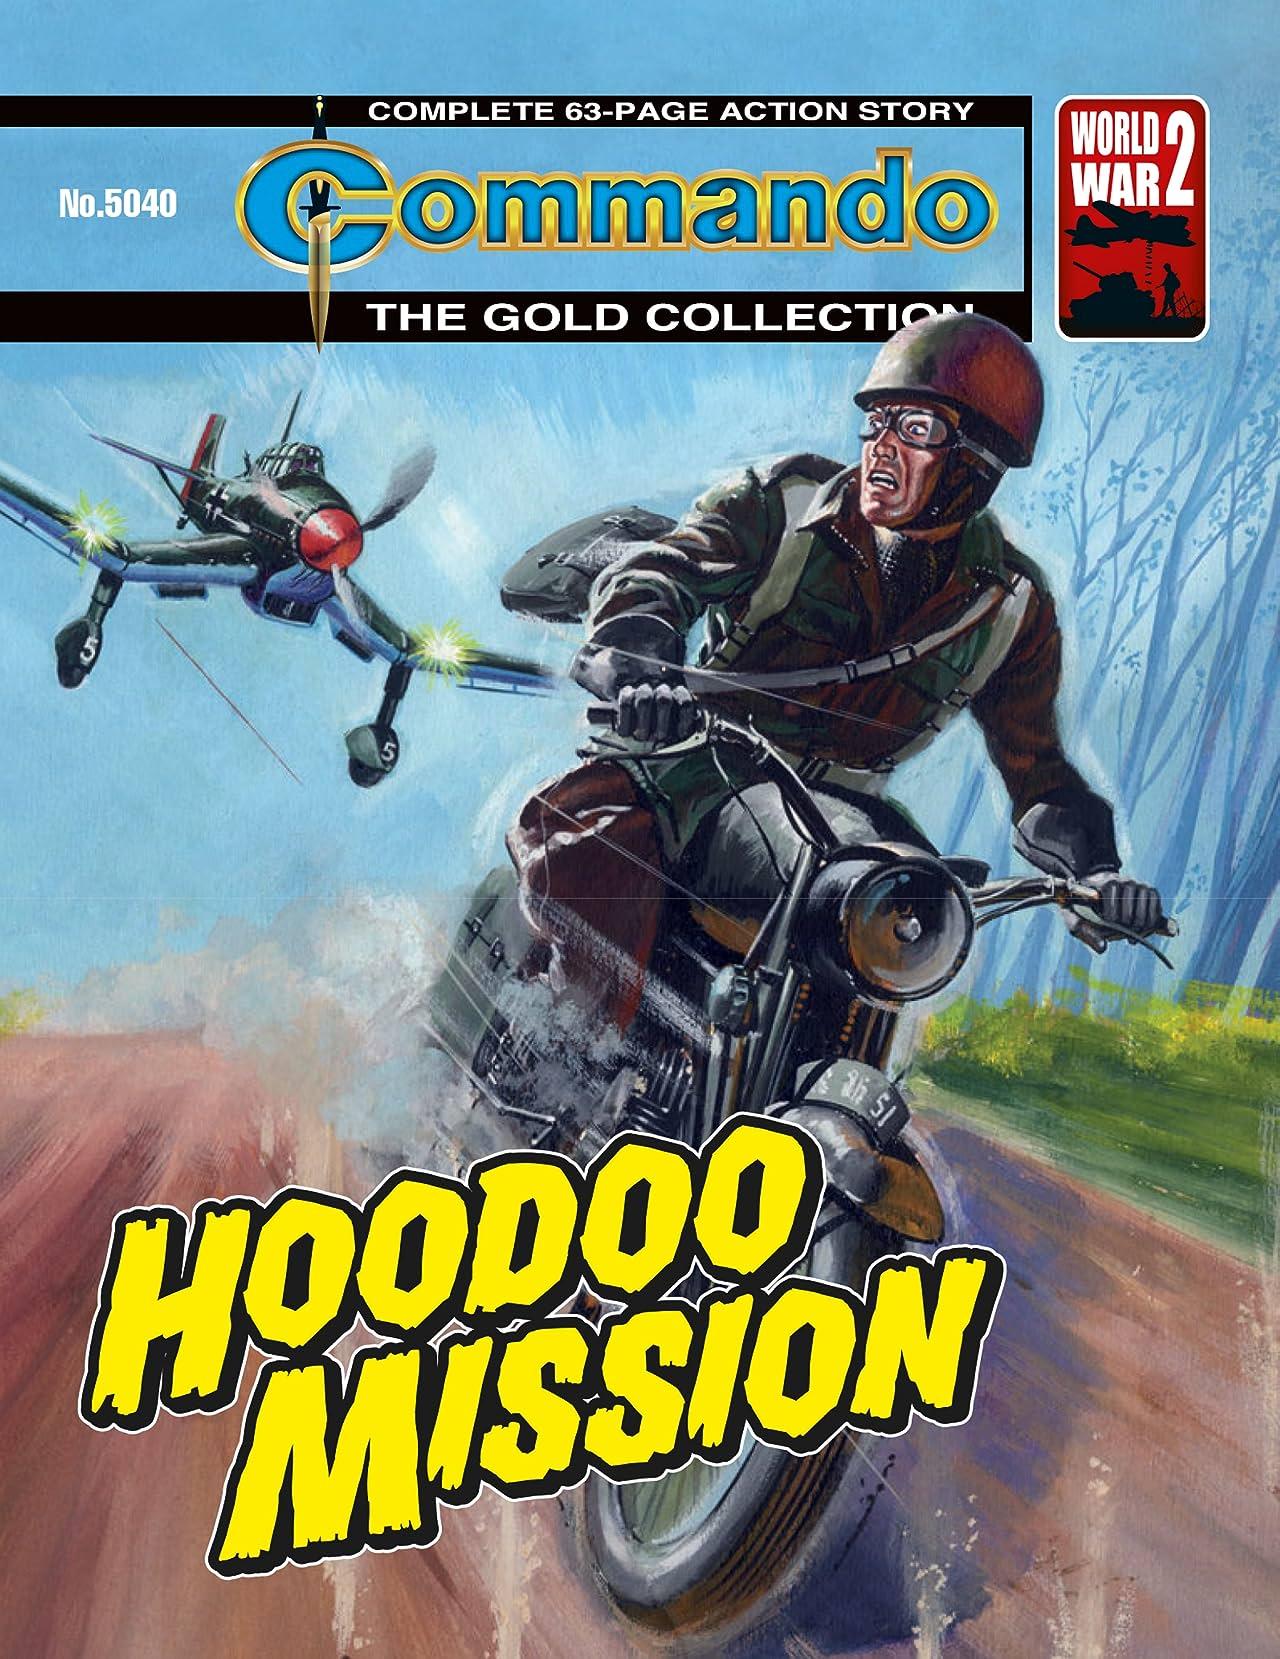 Commando #5040: Hoodoo Mission